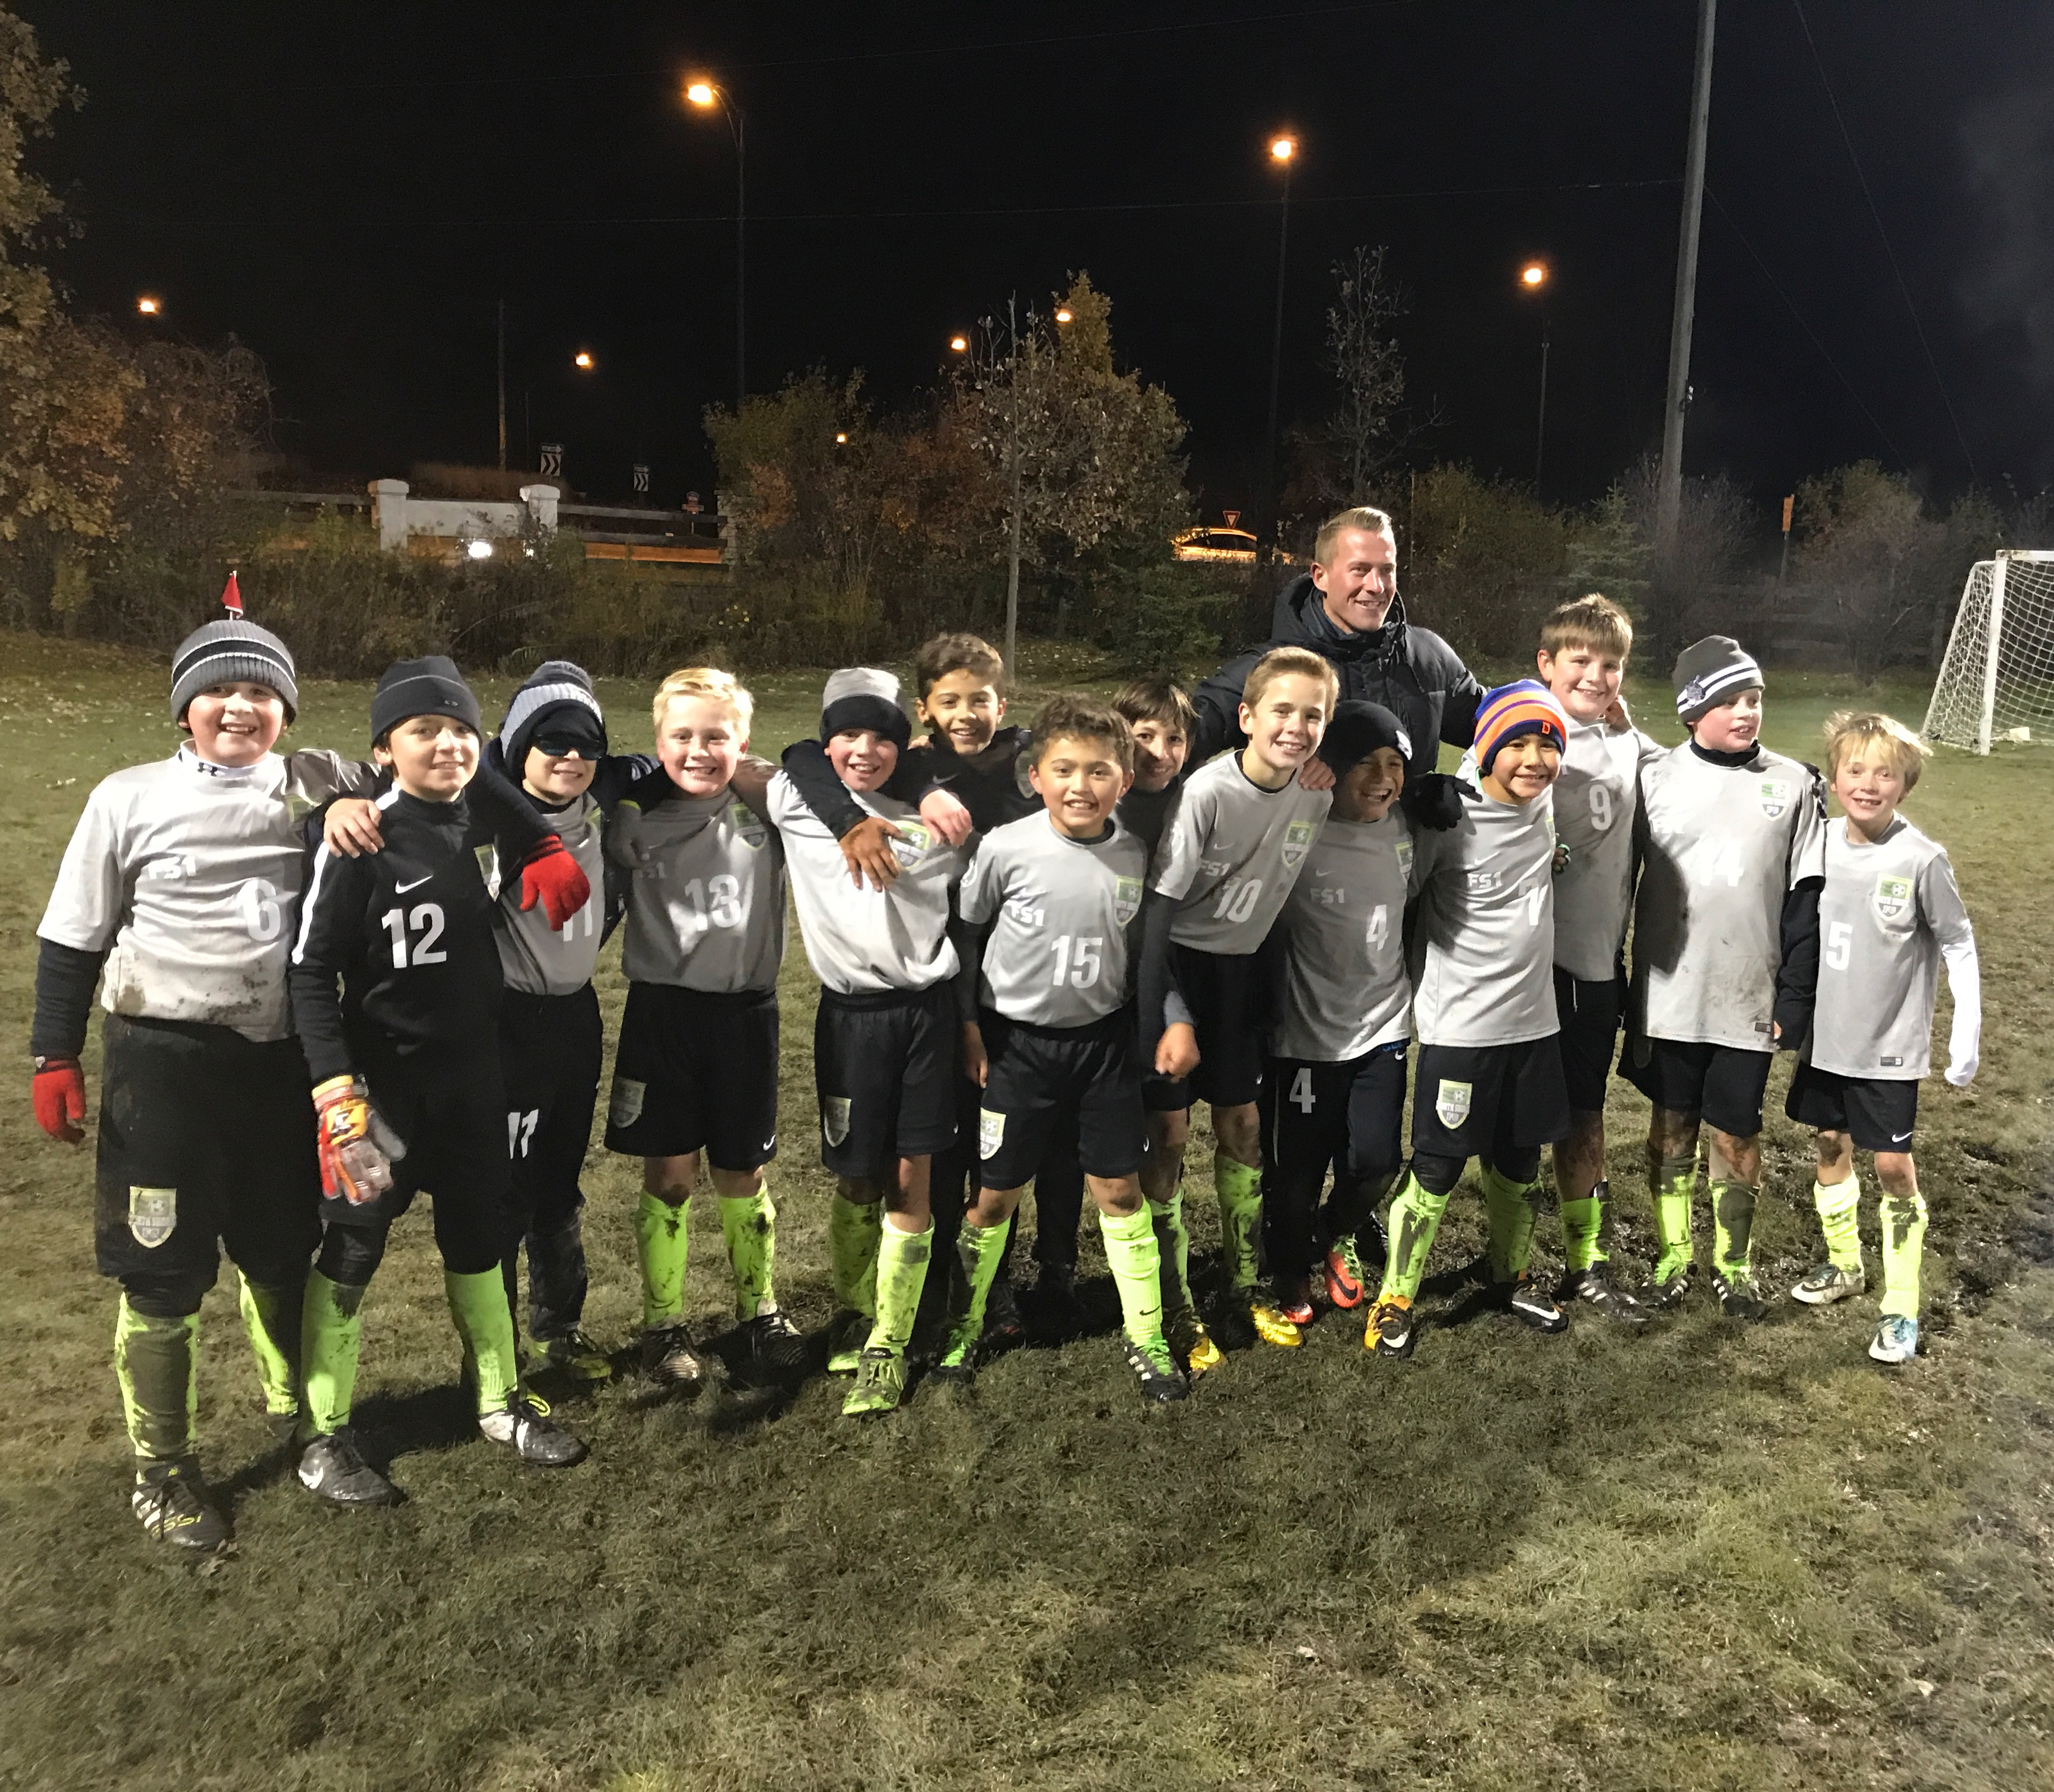 U11 Boys Fall Division Champions